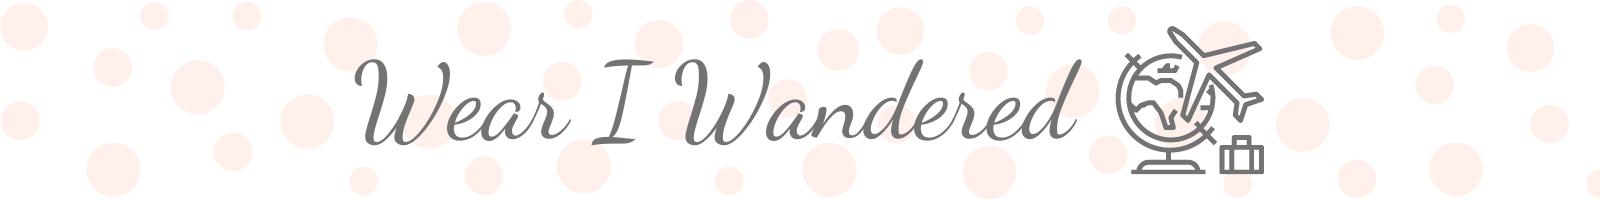 Wear I Wandered